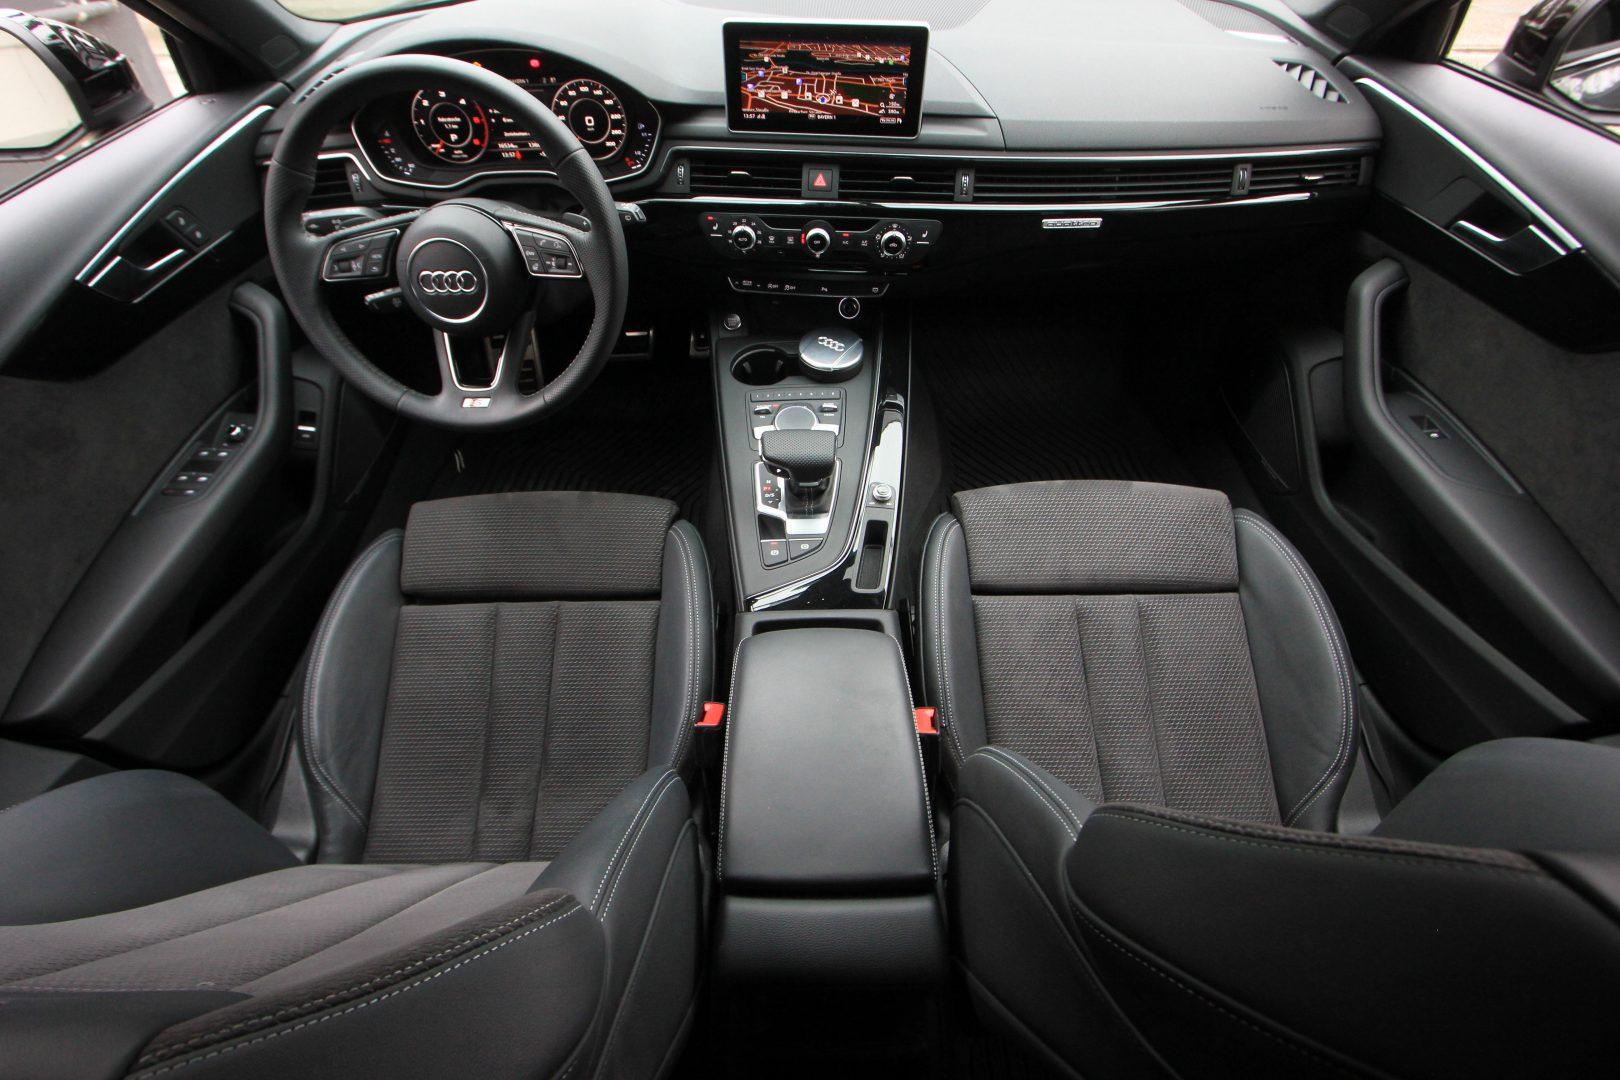 AIL Audi A4 Avant S line Sport / Plus quattro 3.0 TDI 6